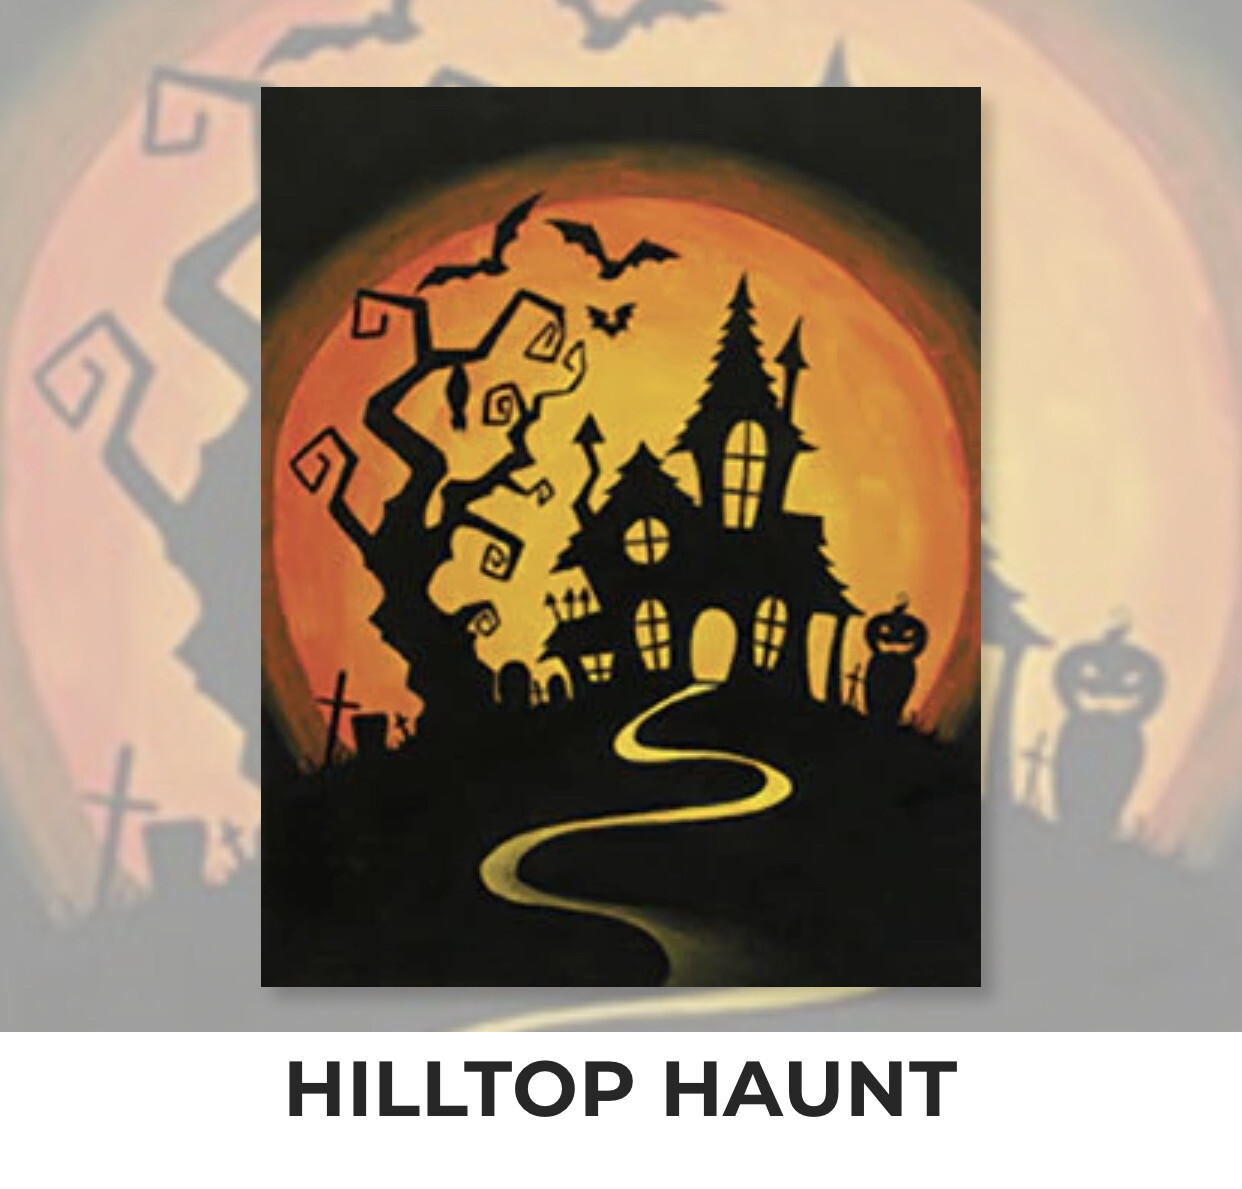 Hilltop Haunt ADULT Acrylic Paint On Canvas DIY Art Kit - 3 Week Special Order